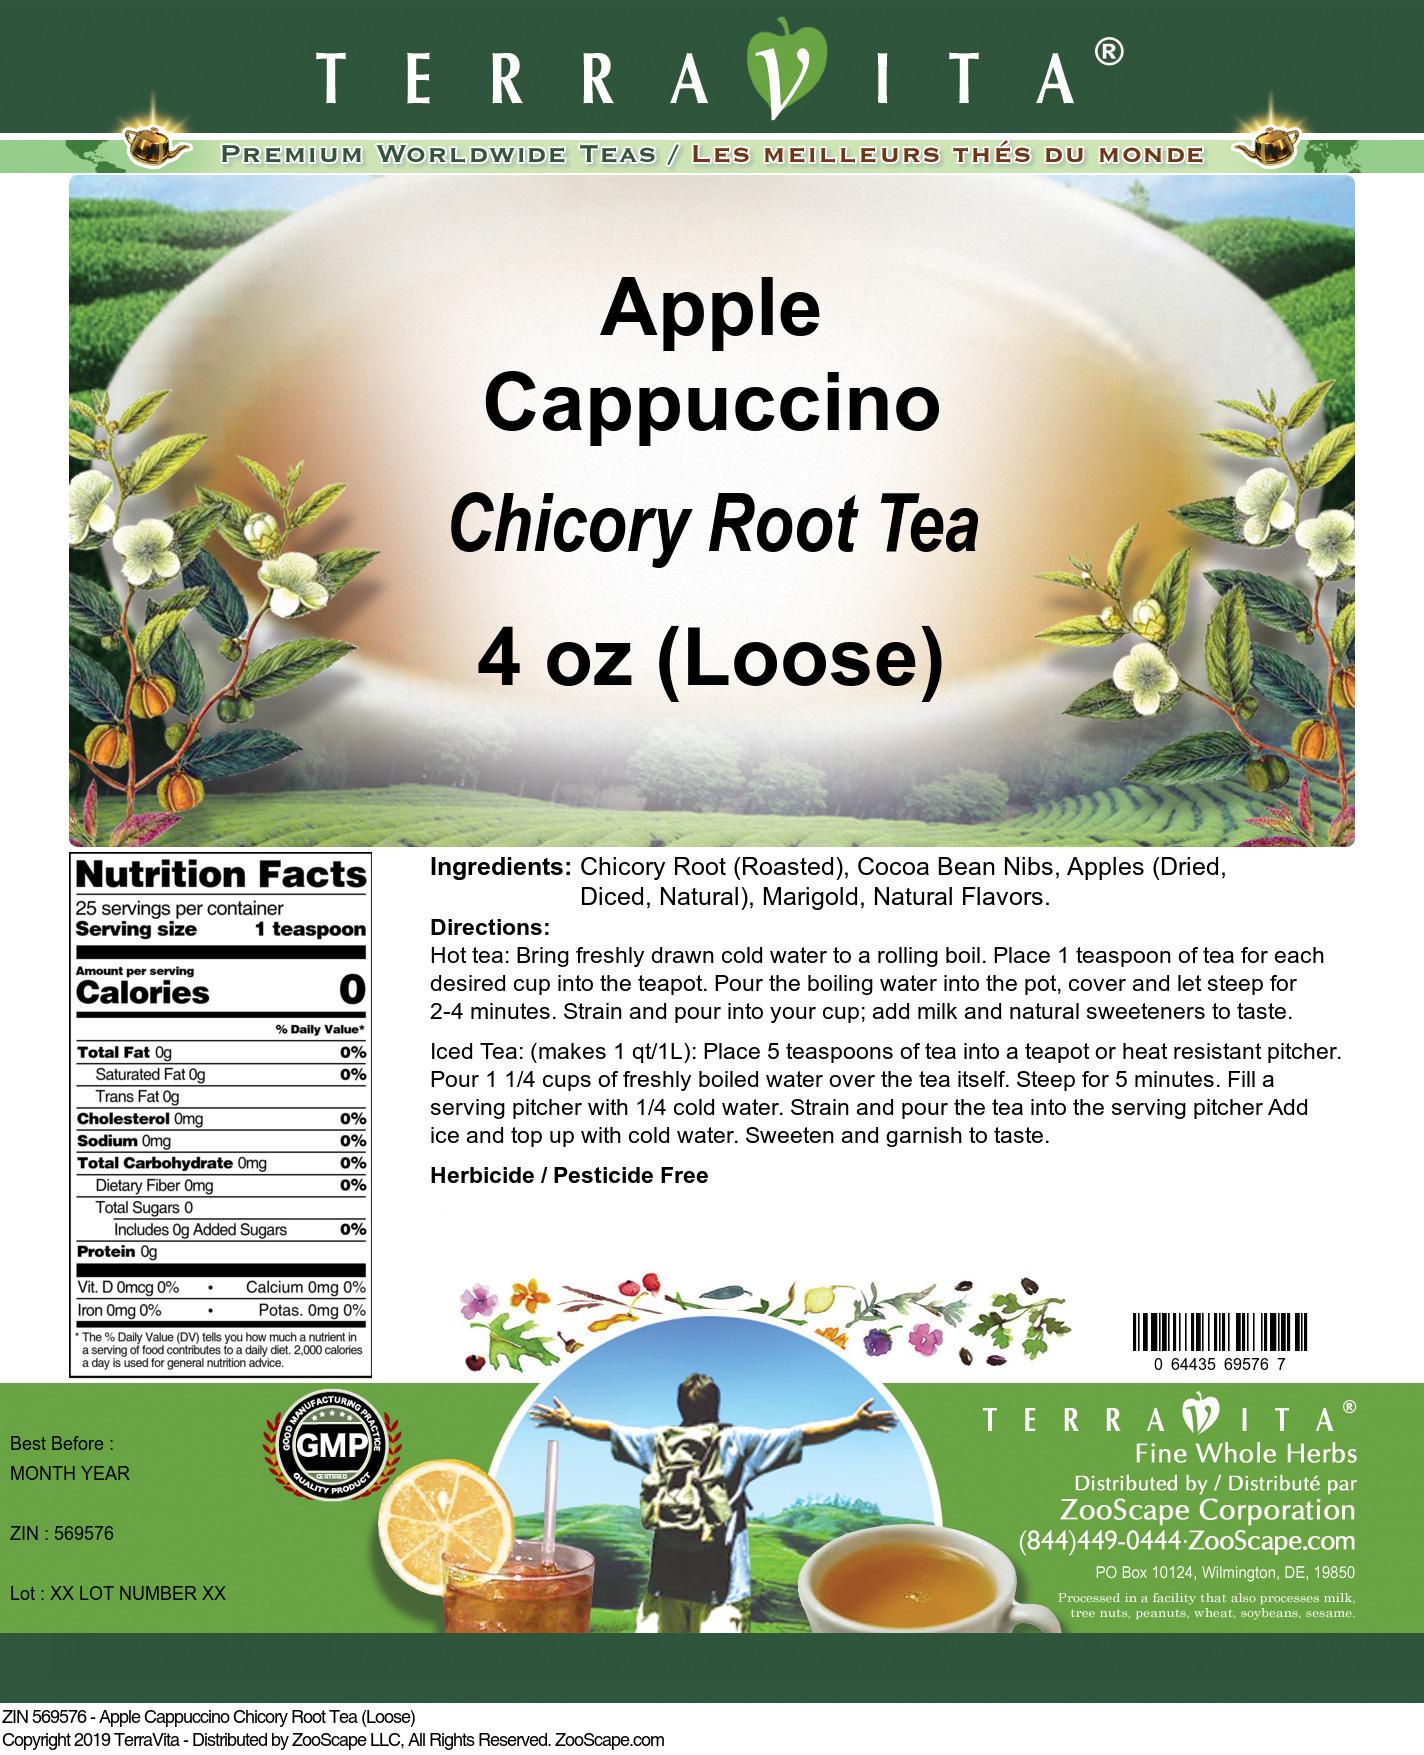 Apple Cappuccino Chicory Root Tea (Loose)